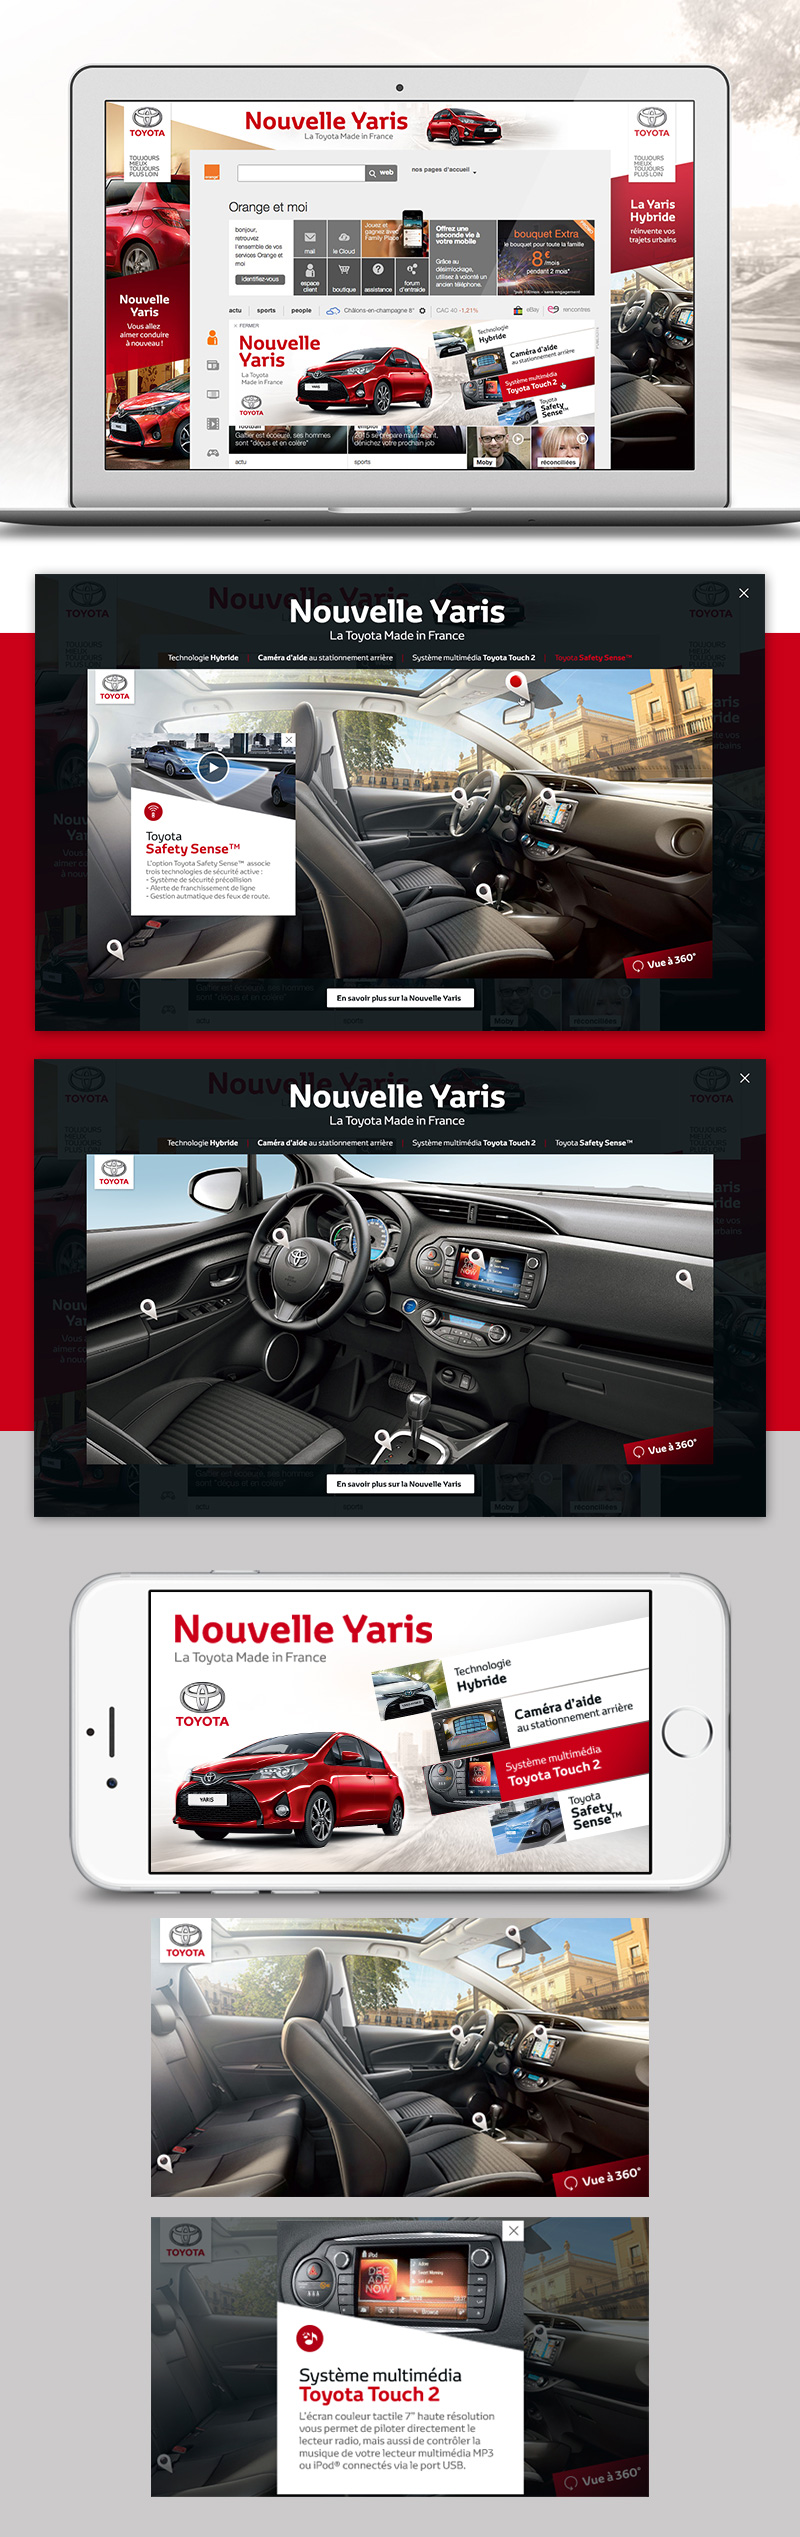 Directeur artistique freelance - Toyota Yaris - Webdesign